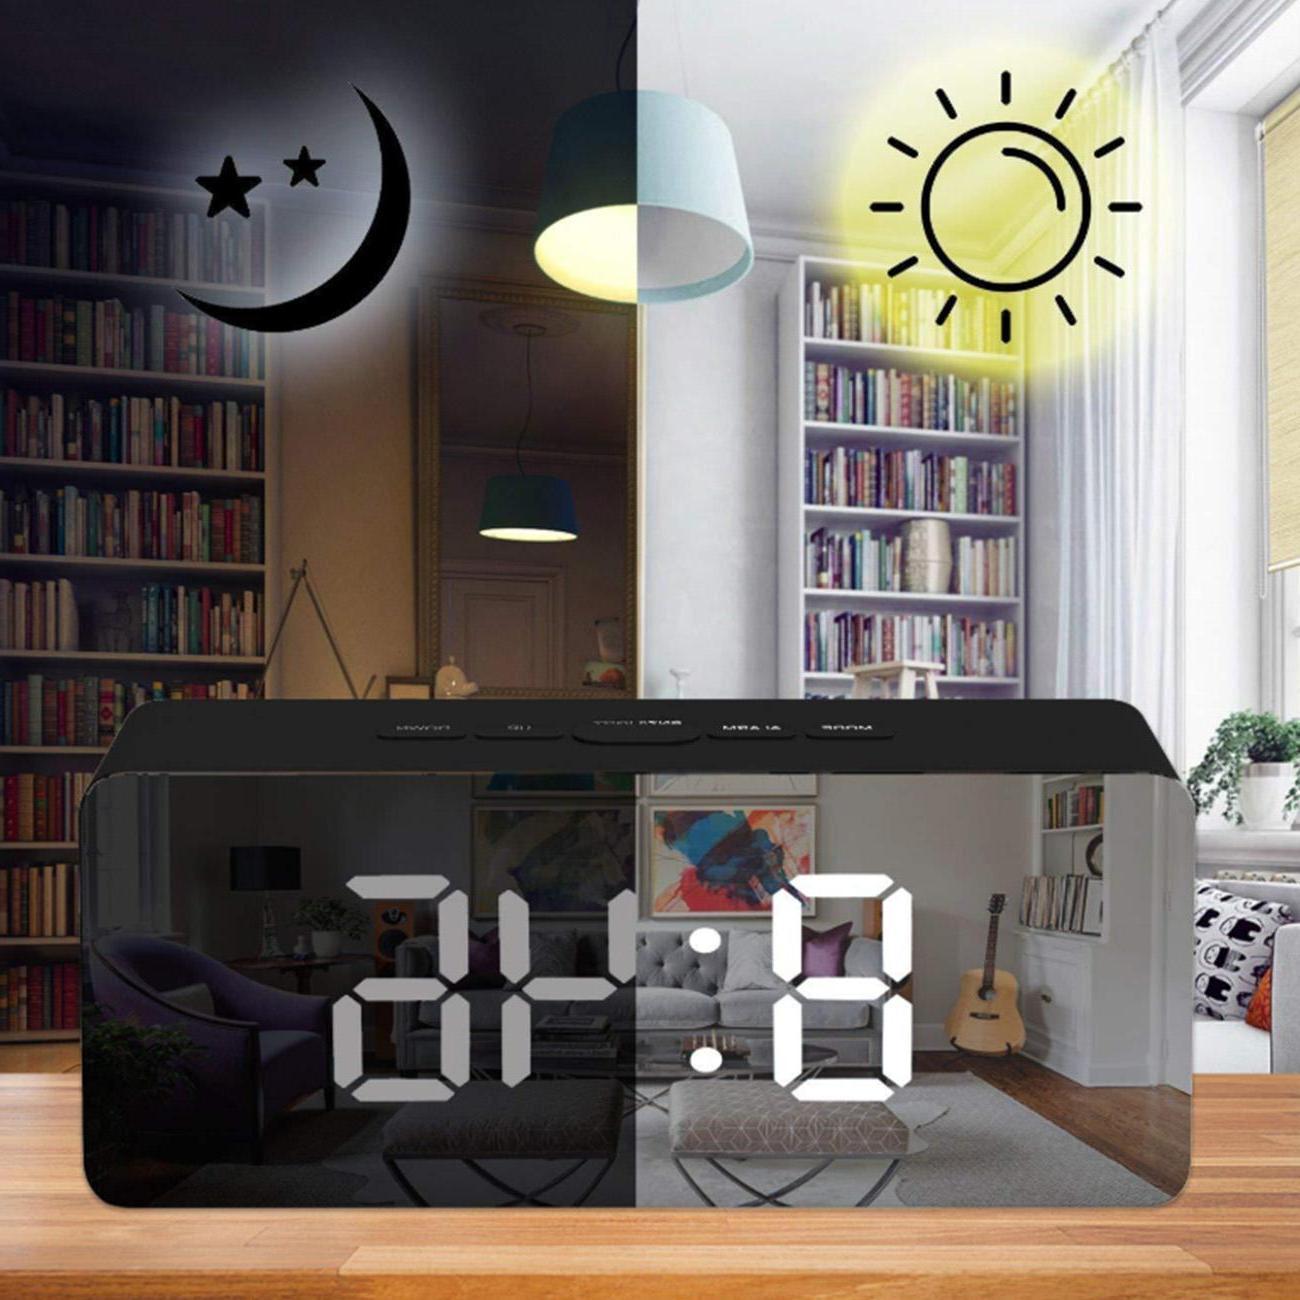 alarm clock large digital led display portable